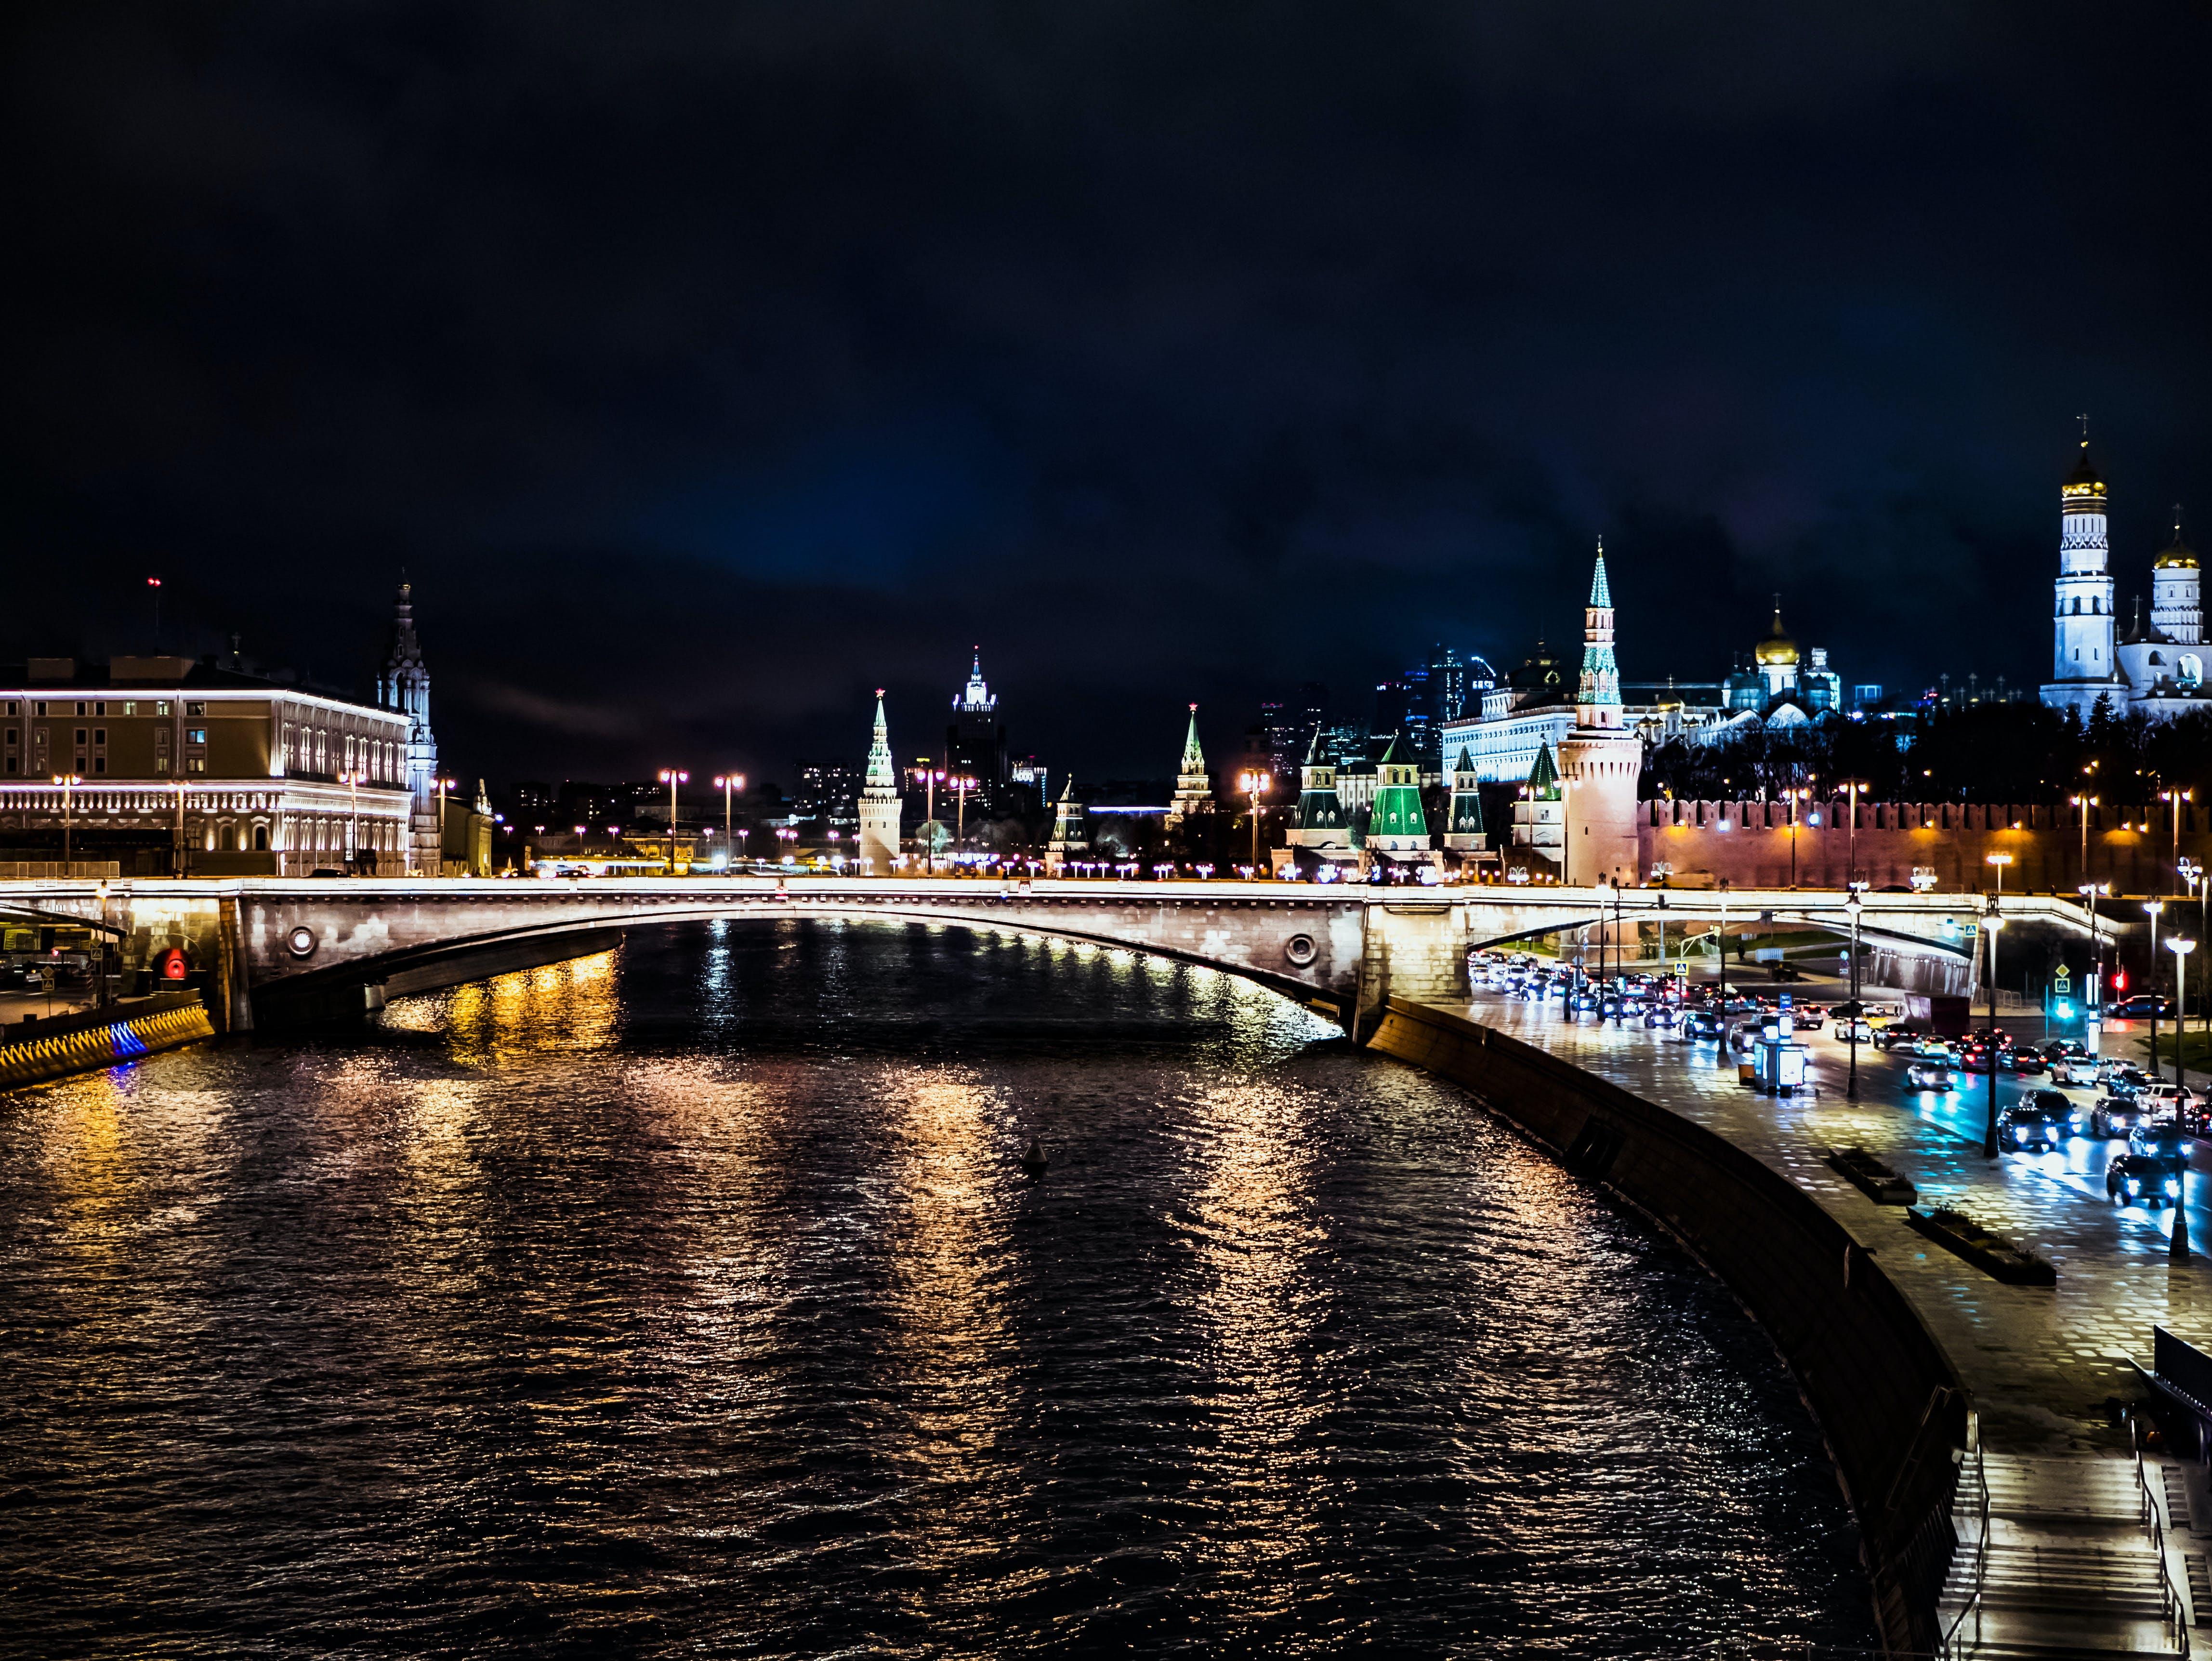 Lighted Bridge Across Body of Water Under Night Sky